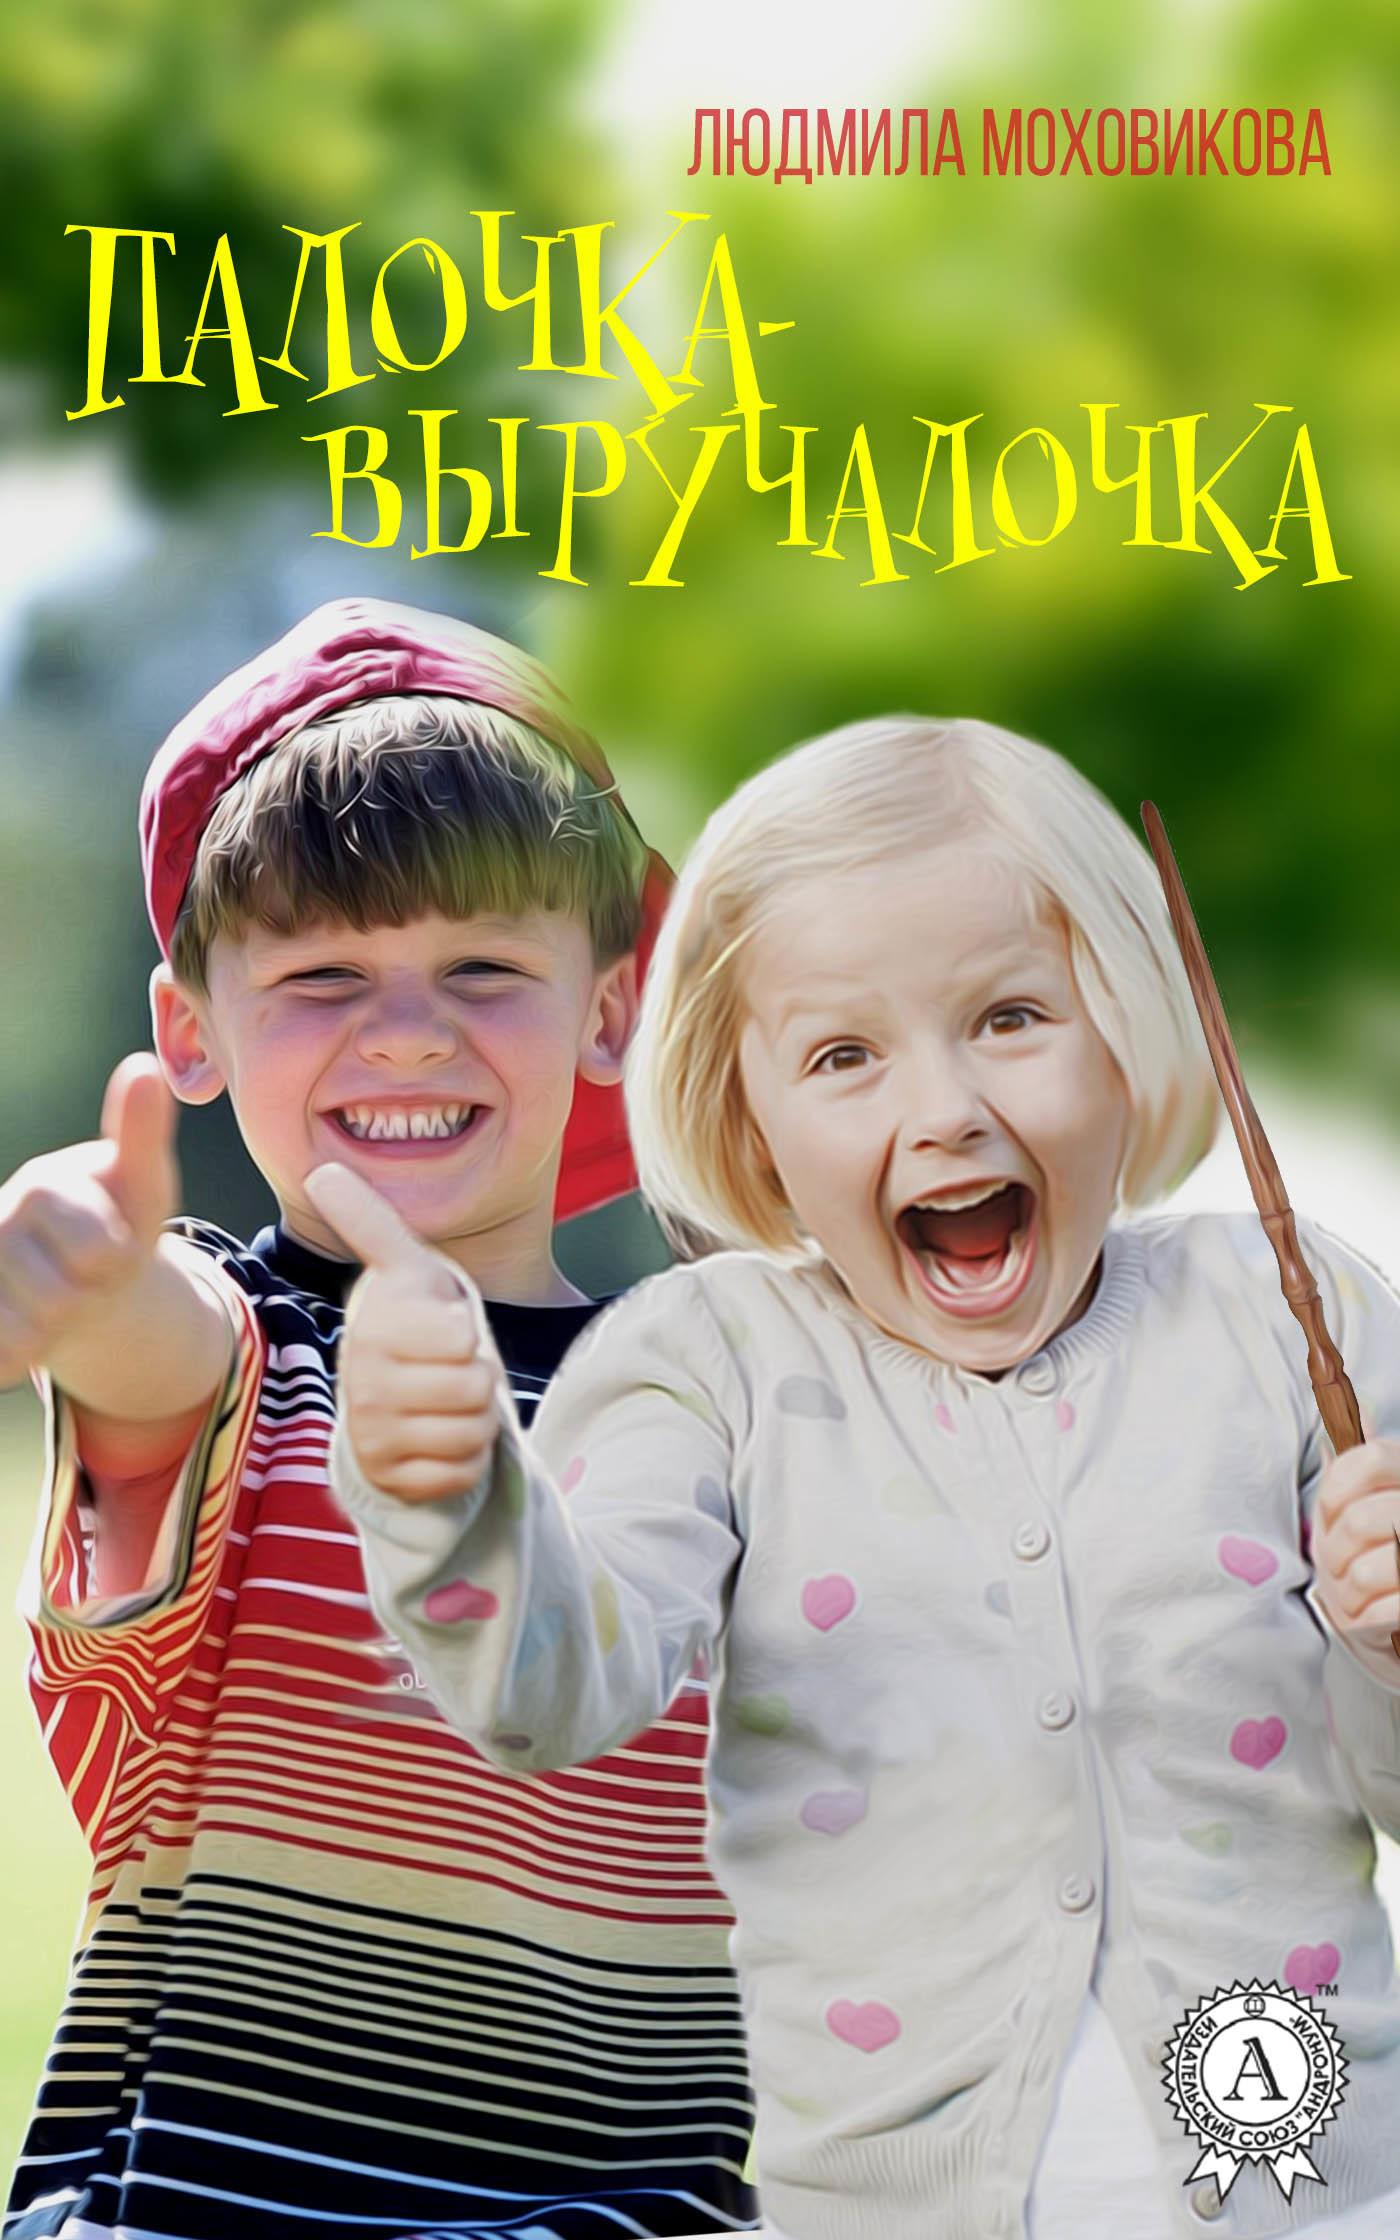 Людмила Моховикова Палочка-выручалочка цены онлайн